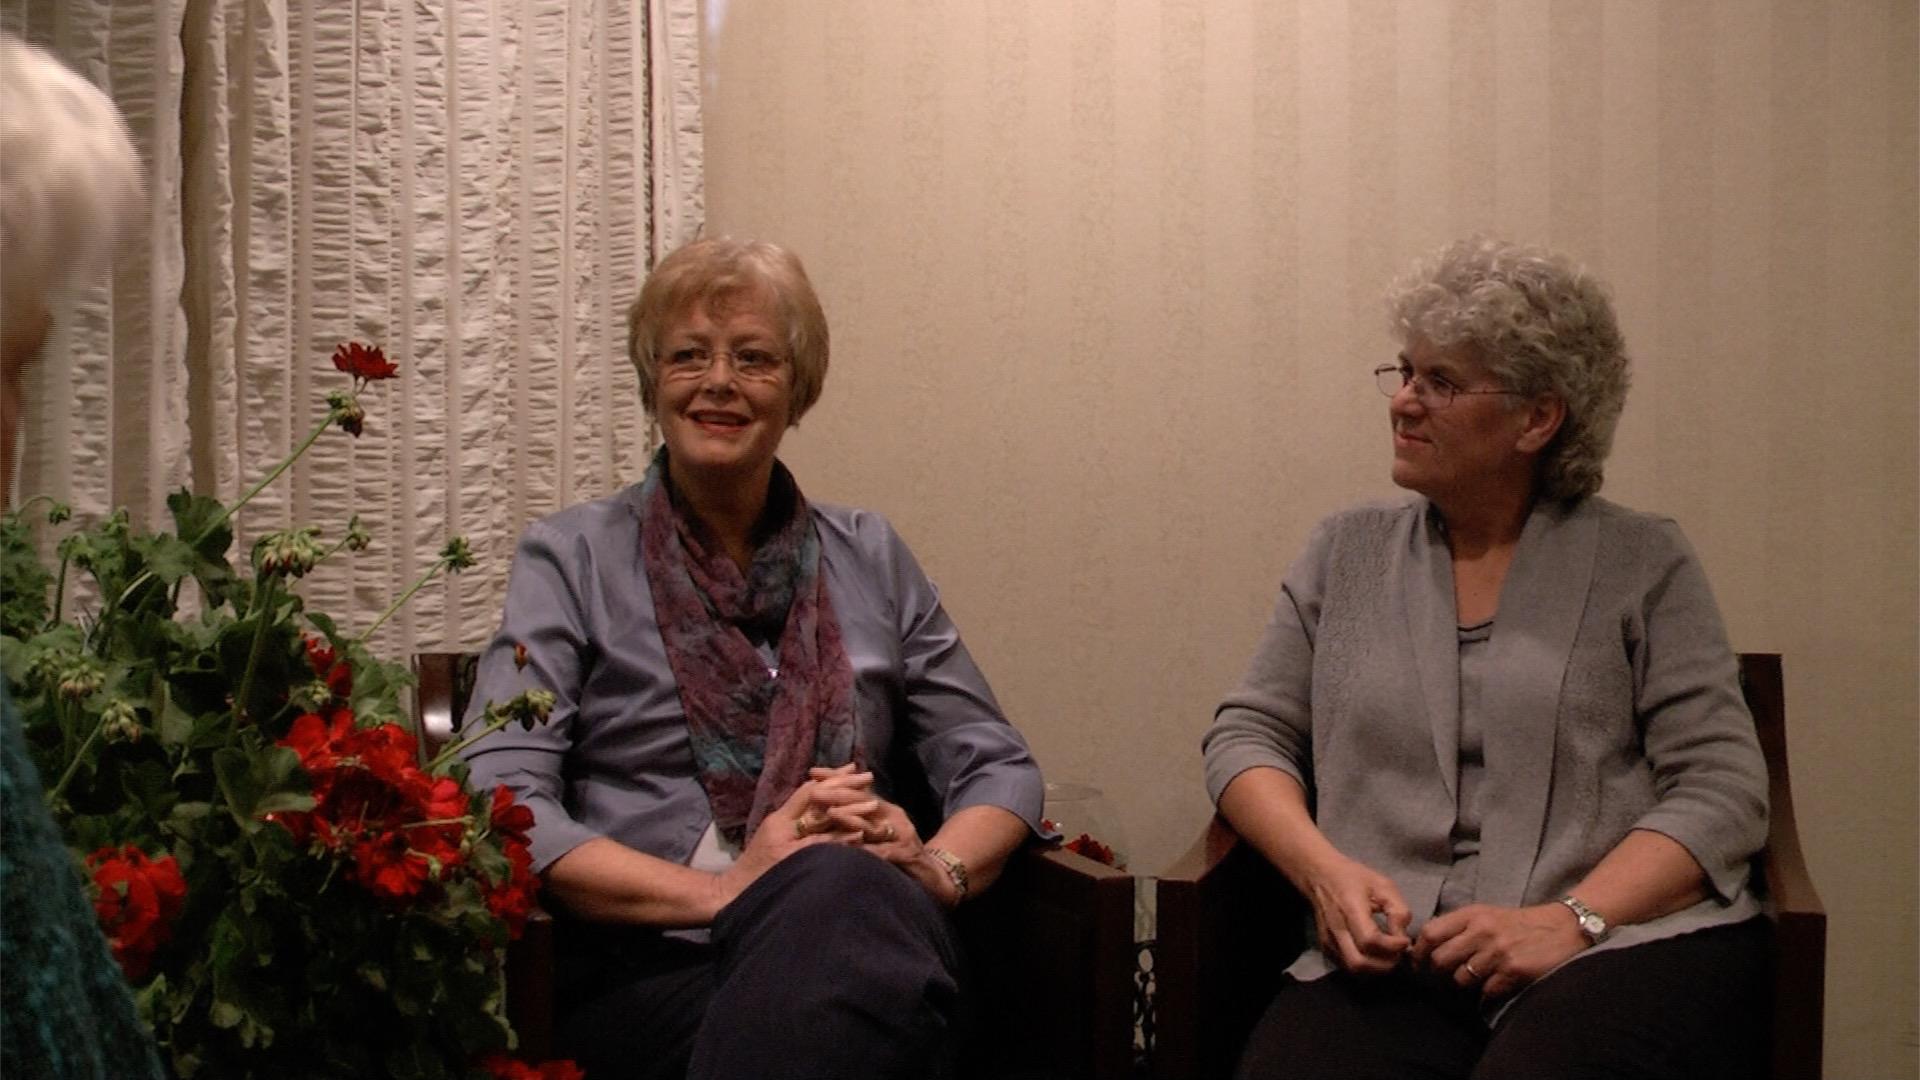 Linda Wagner and Paula Gubrud -Howe sit down with Dr. Benner